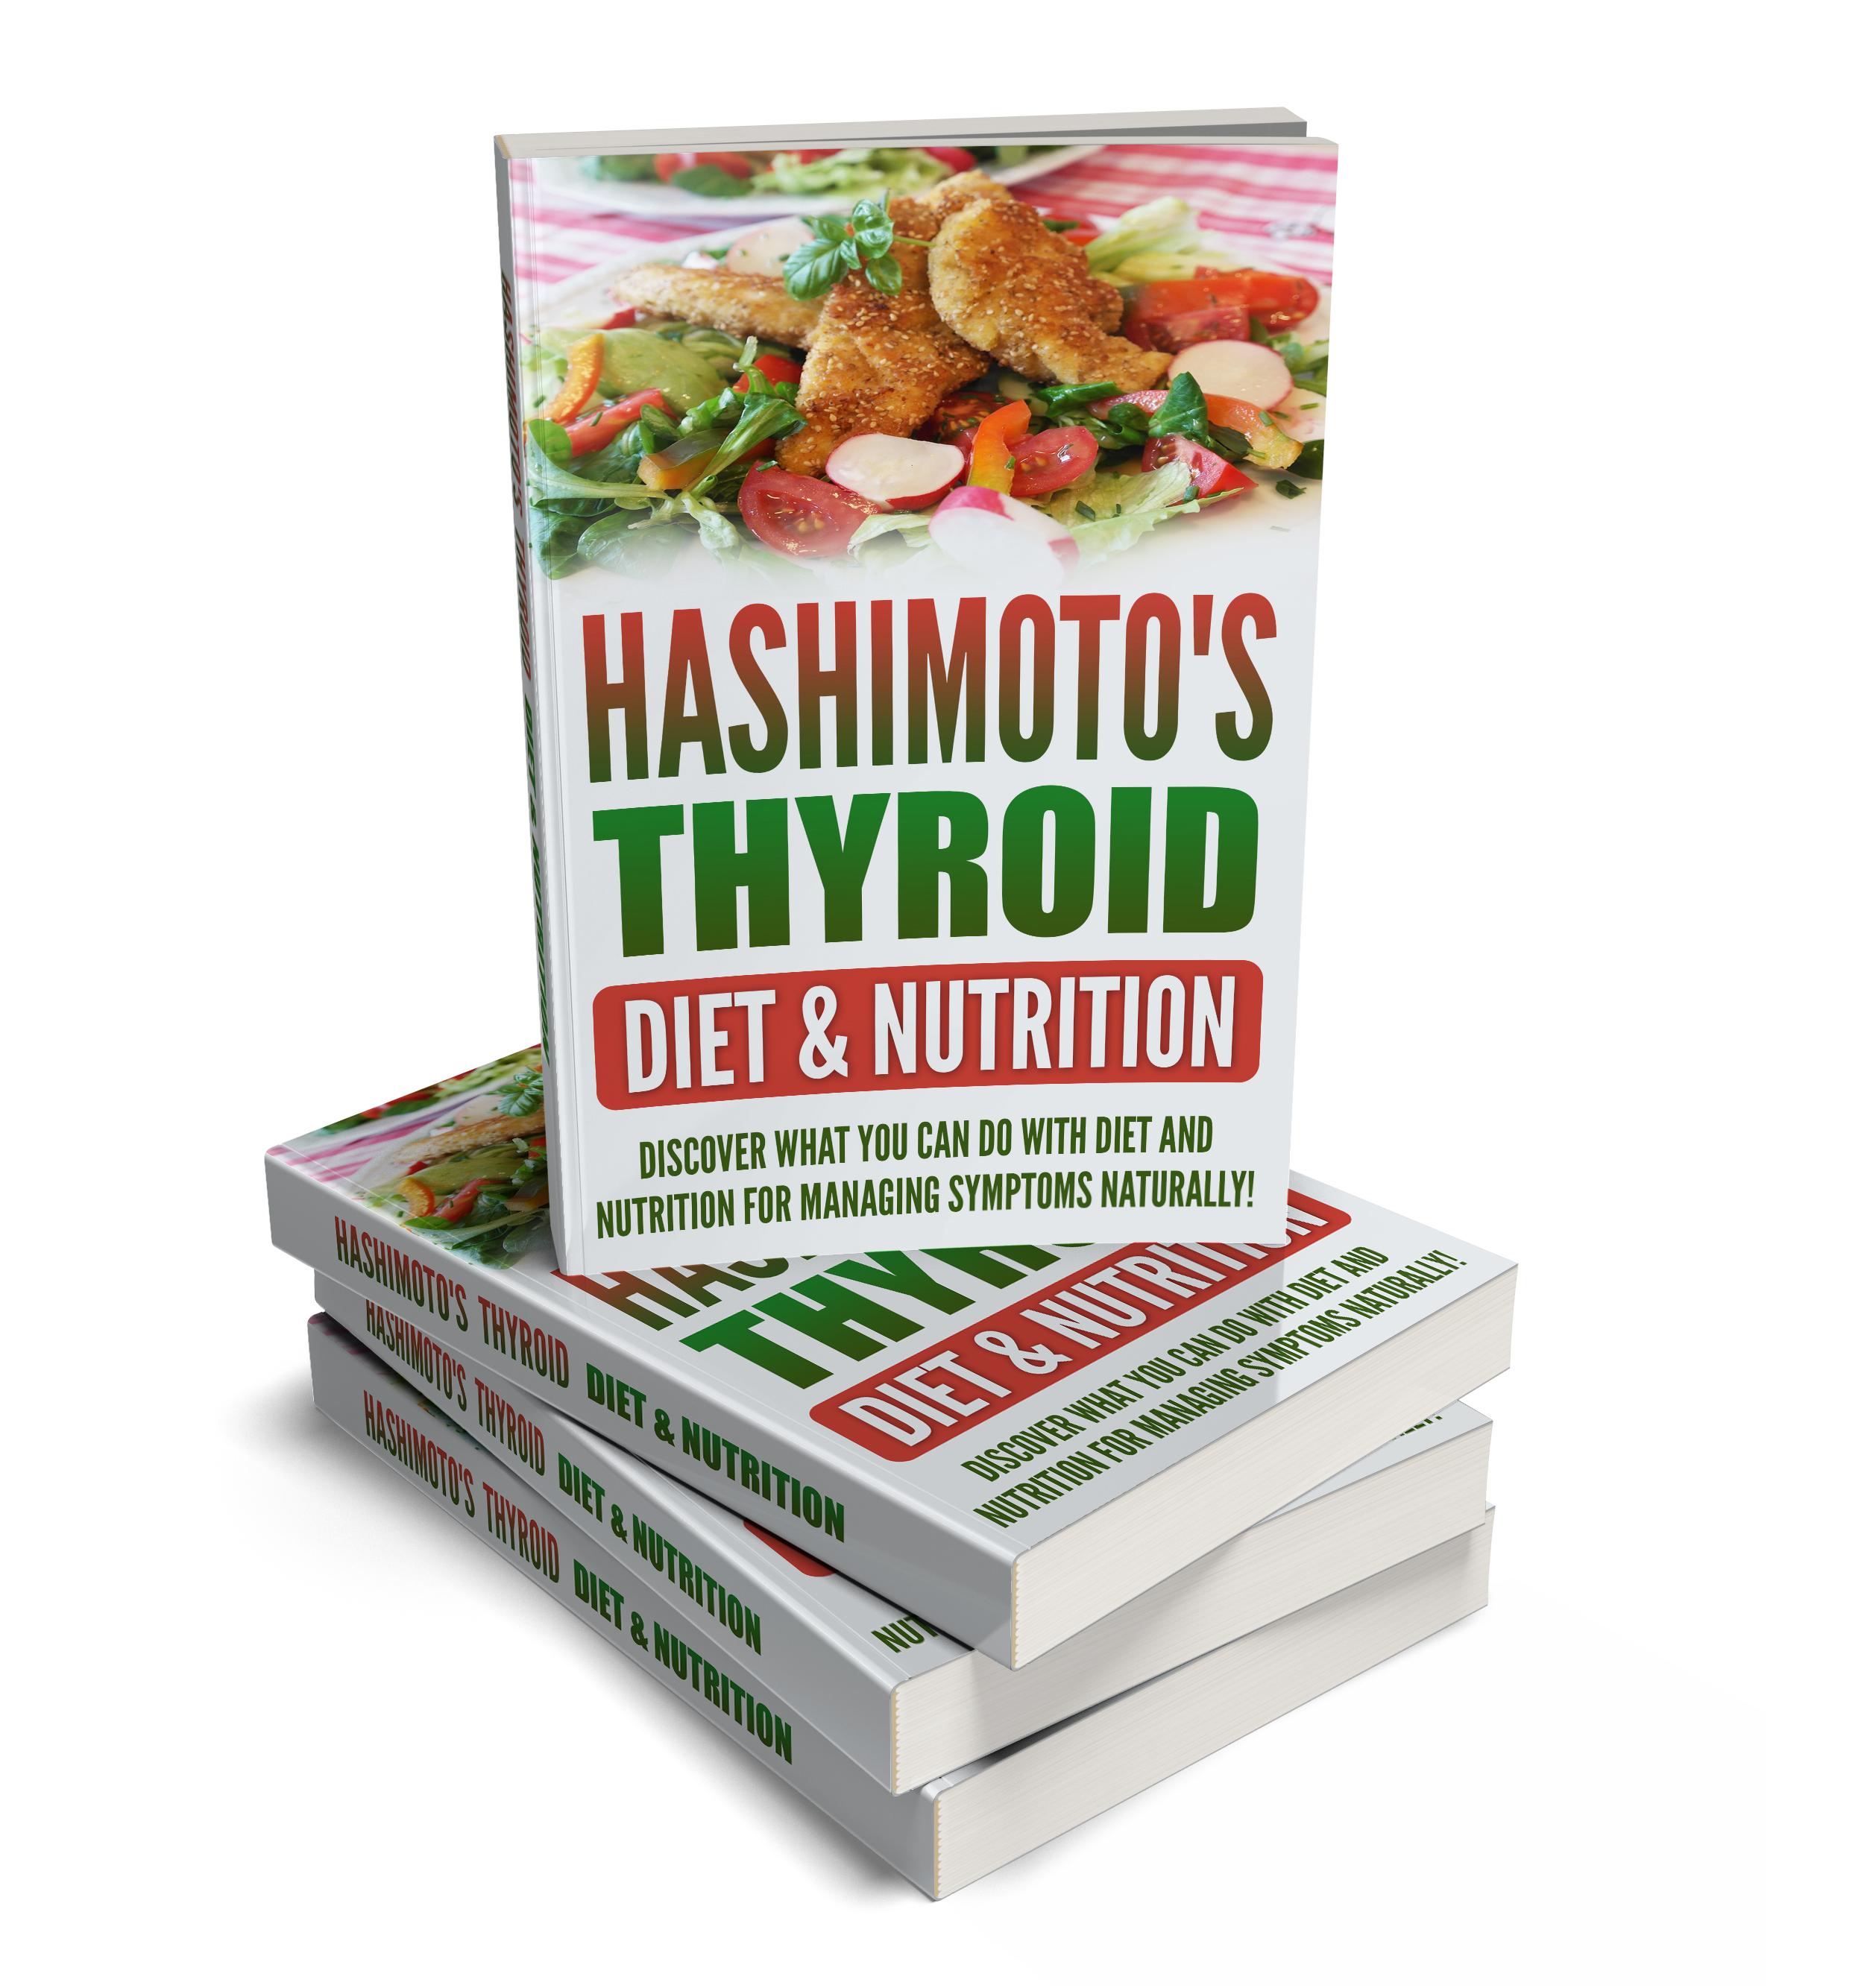 Hashimotos Thyroid Diet